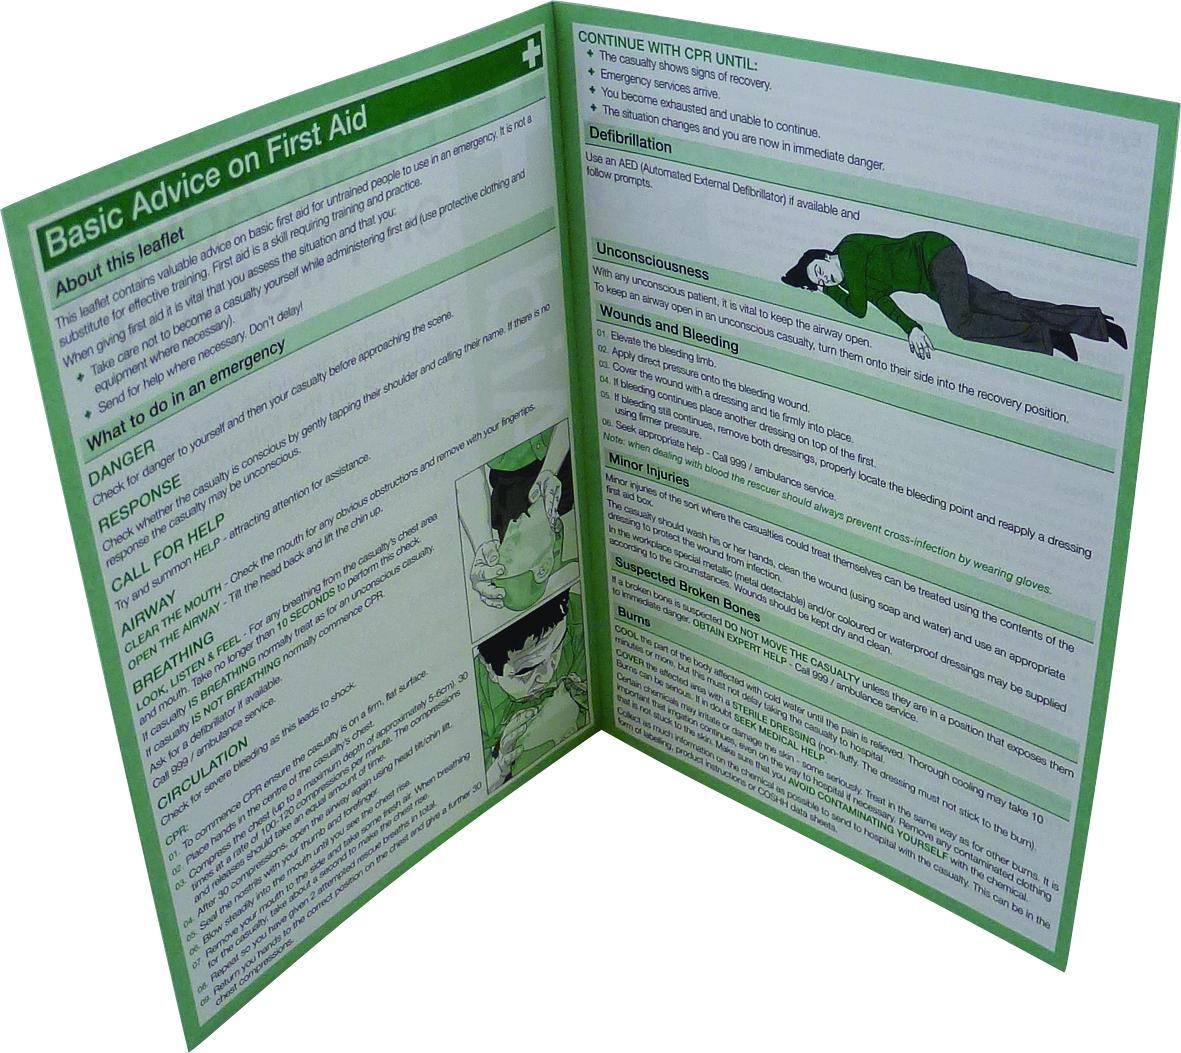 First Aid Guidance Leaflet Aid Training